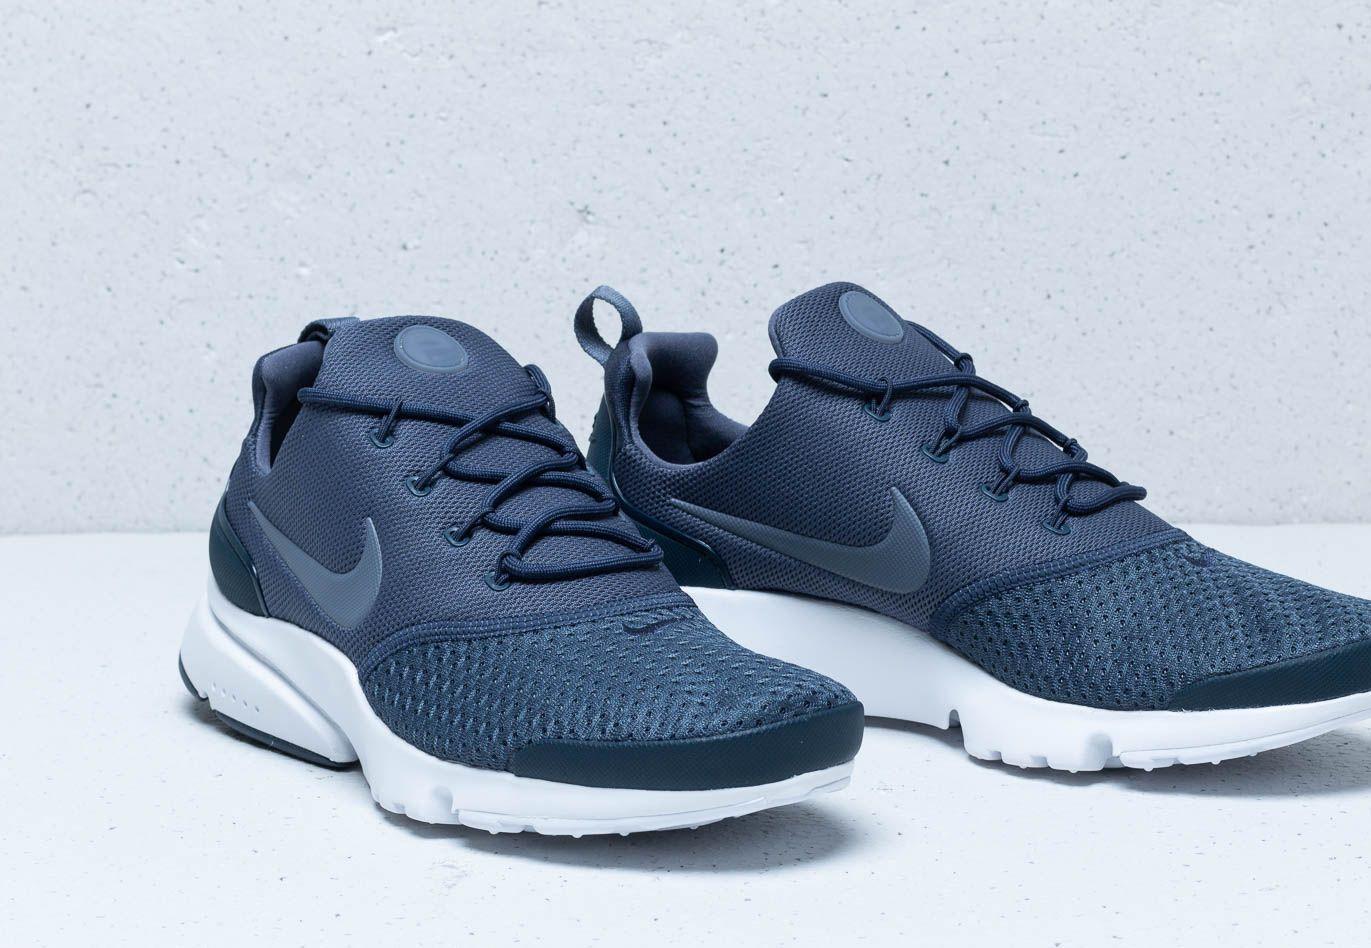 competitive price 7cc85 79431 Nike - Presto Fly Se Thunder Blue  Light Carbon for Men - Lyst. View  fullscreen